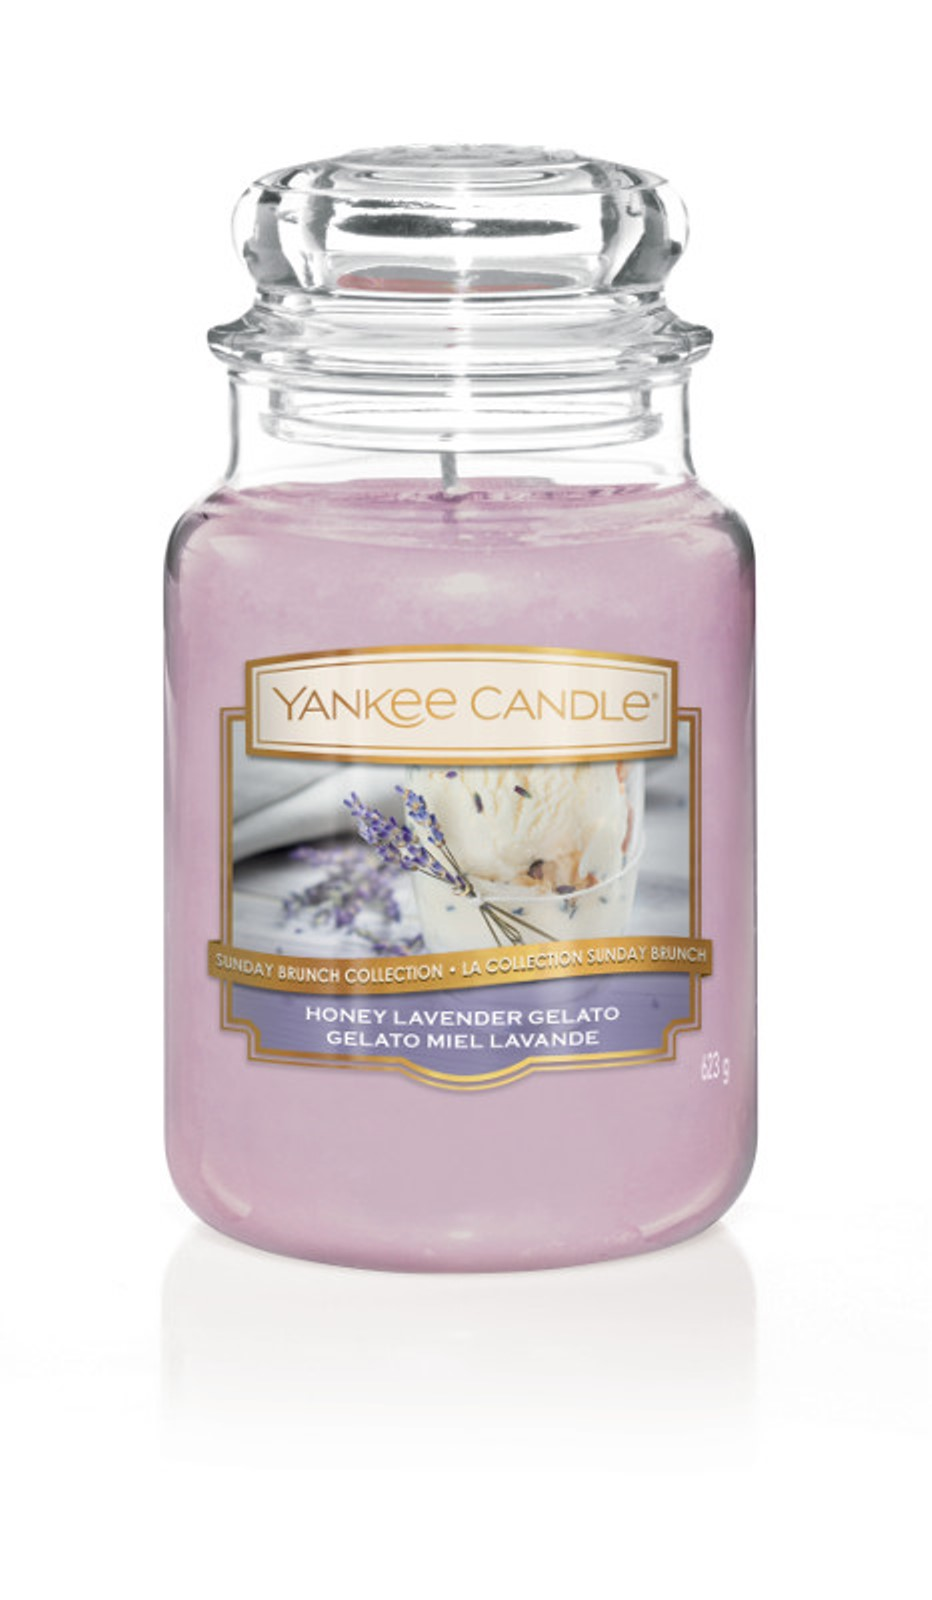 Свеча ароматизированная Yankee Candle Медово-лавандовый пломбир Honey Lavender Gelato 623 гр / 110-150 часов1521680E, сиреневый ароматическая свеча yankee candle summer peach jar candle объем 623 г 623 мл